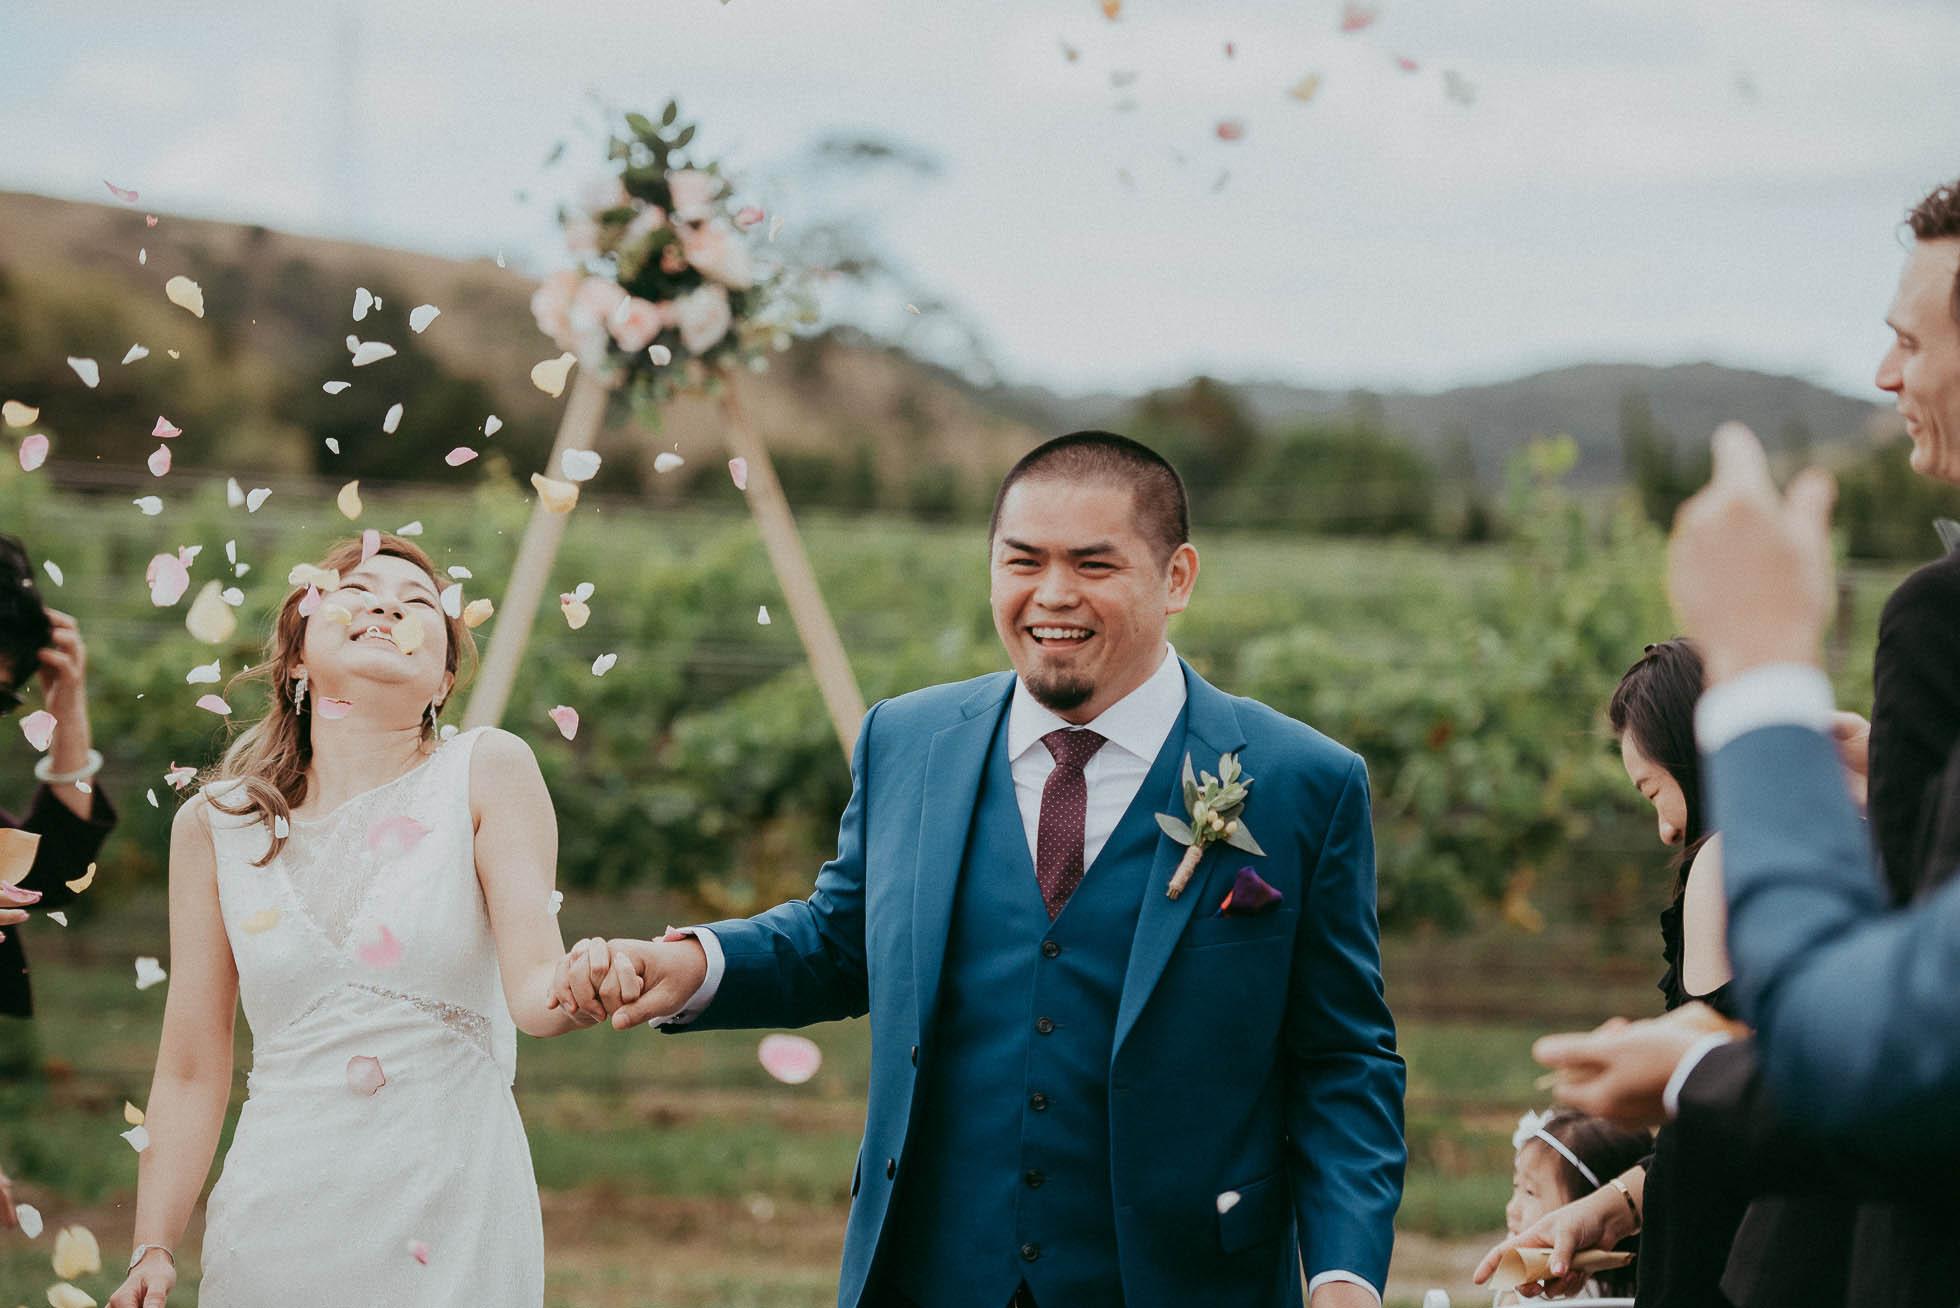 Confetti is thrown as couple walks down aisle at wedding